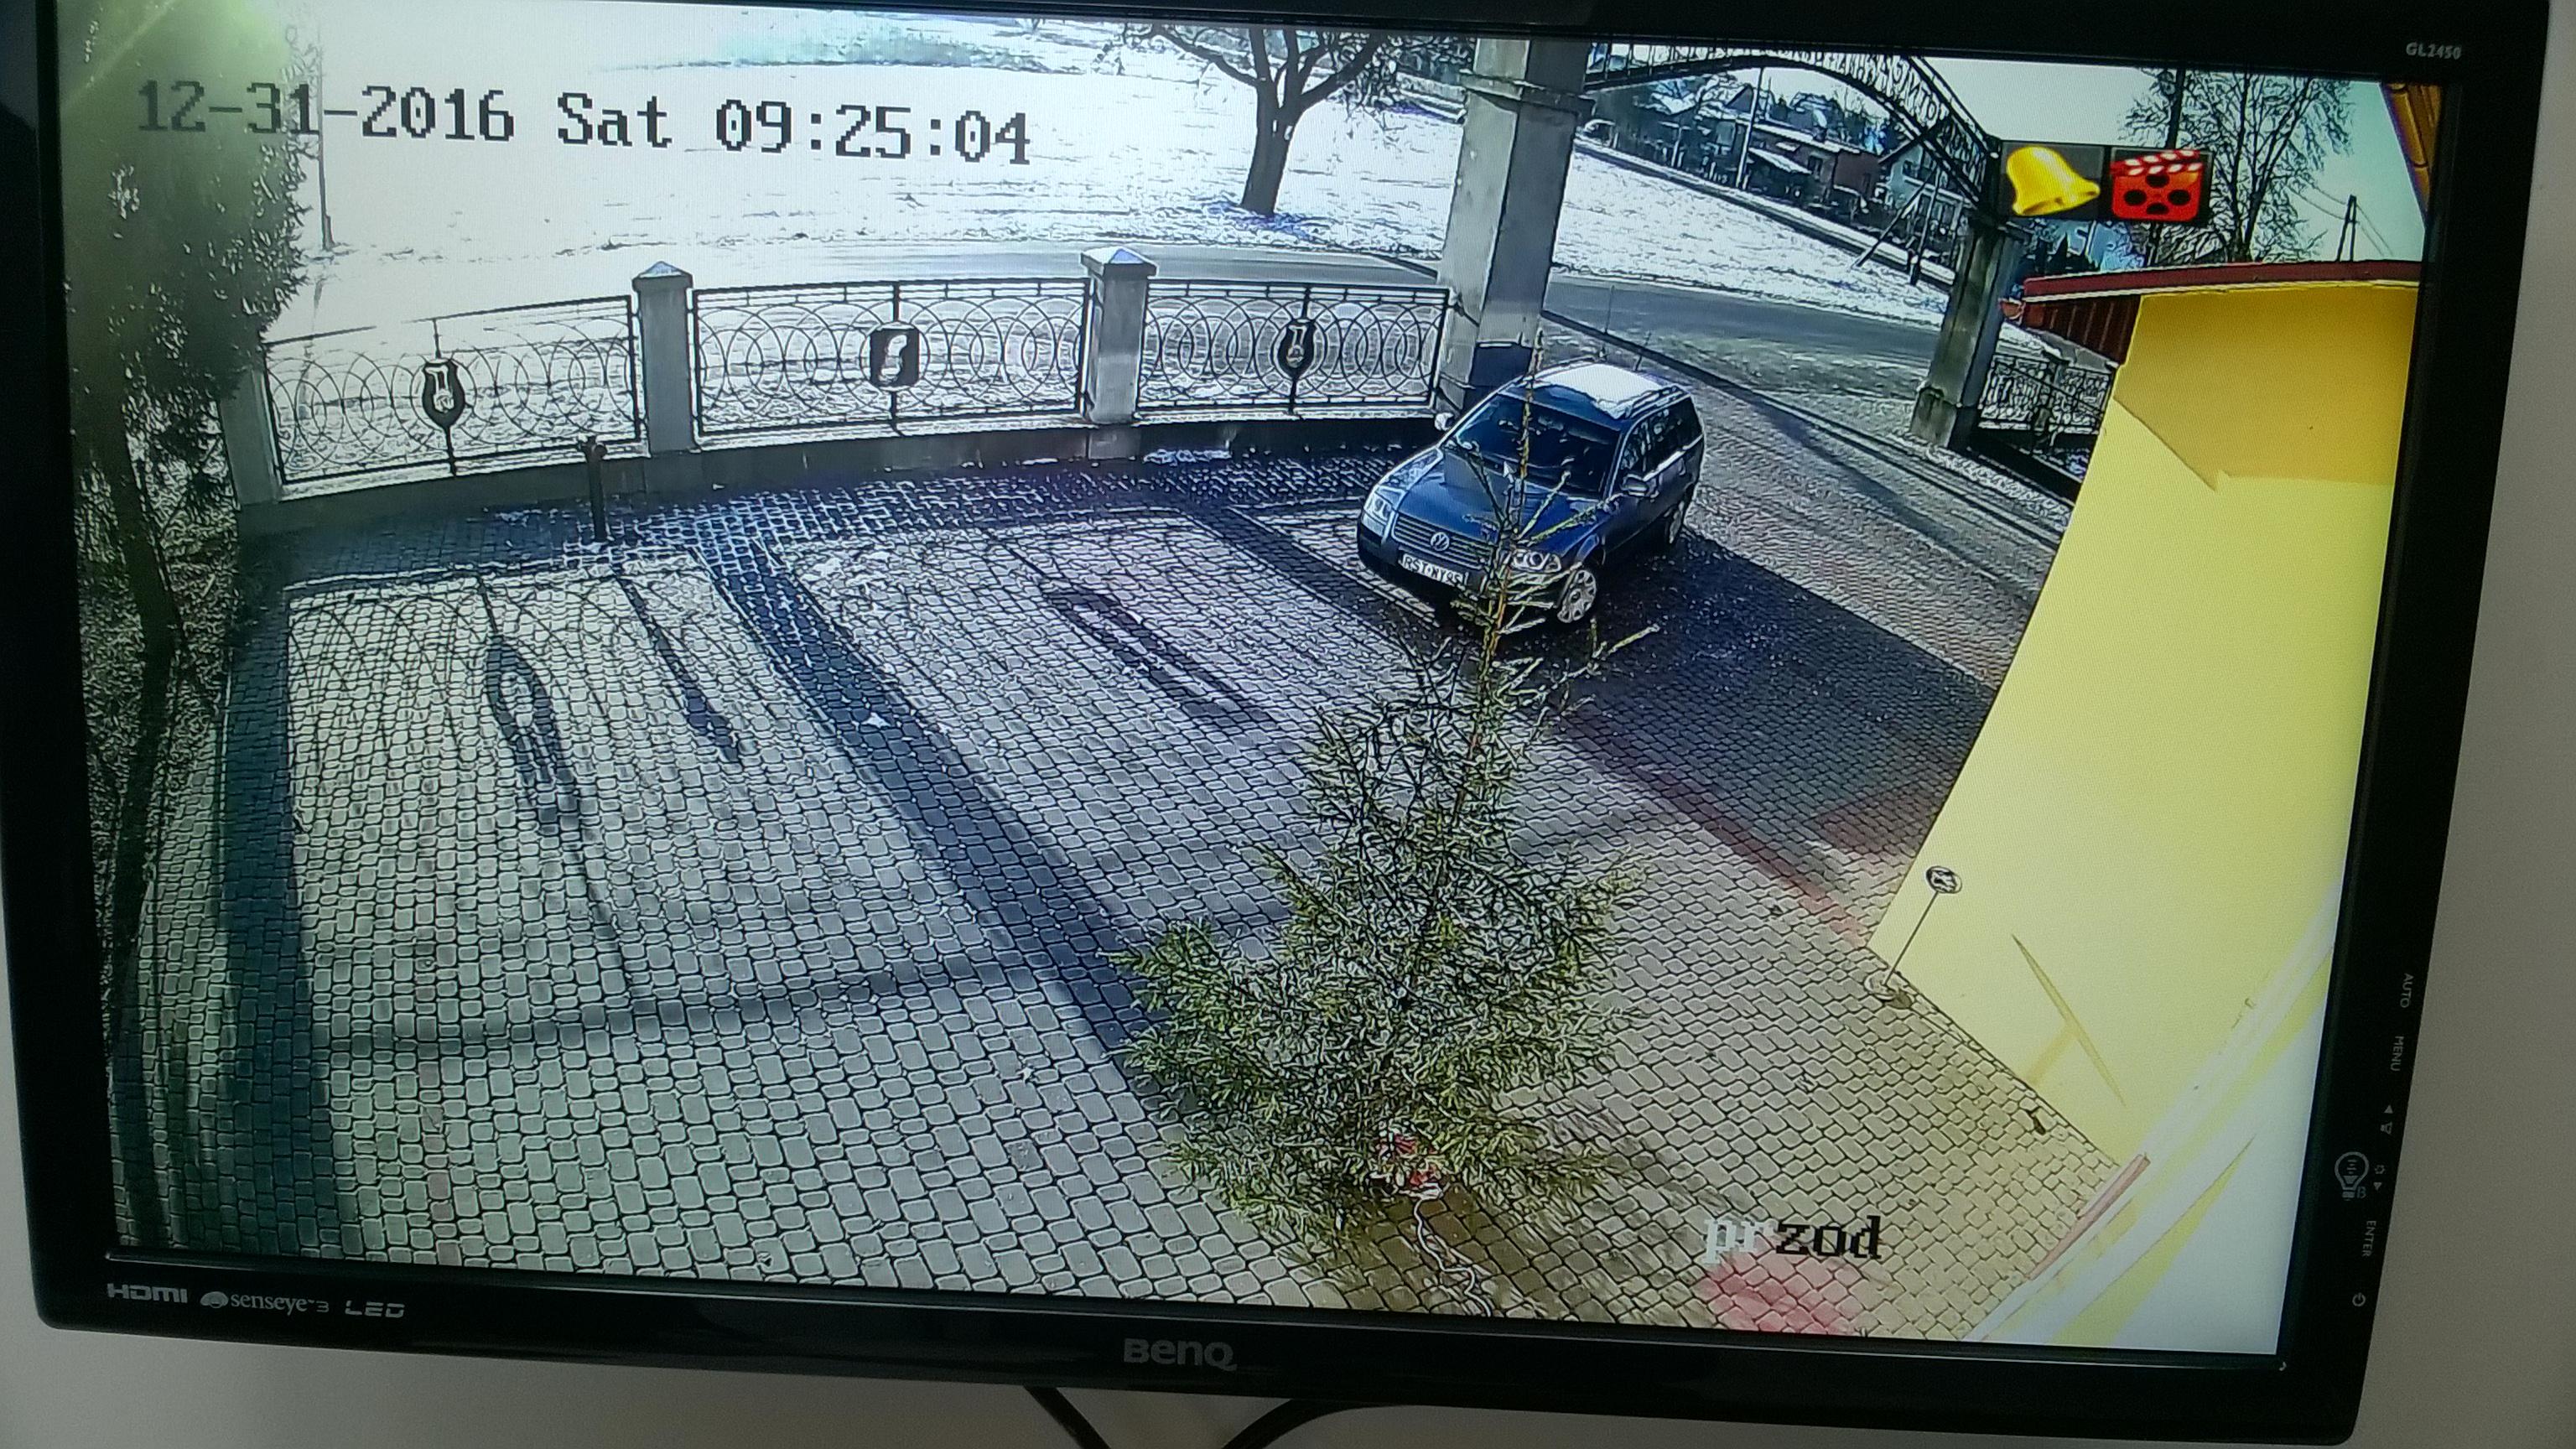 PREZENTACJA ASORTYMENTU PRODUCENTA HIKVISION Kamera IP kopułowa Hikvision DS-2CD2142FWD-I (4 MPix, 2.8mm, 0.01 lx, IK08, IR do 30 m)